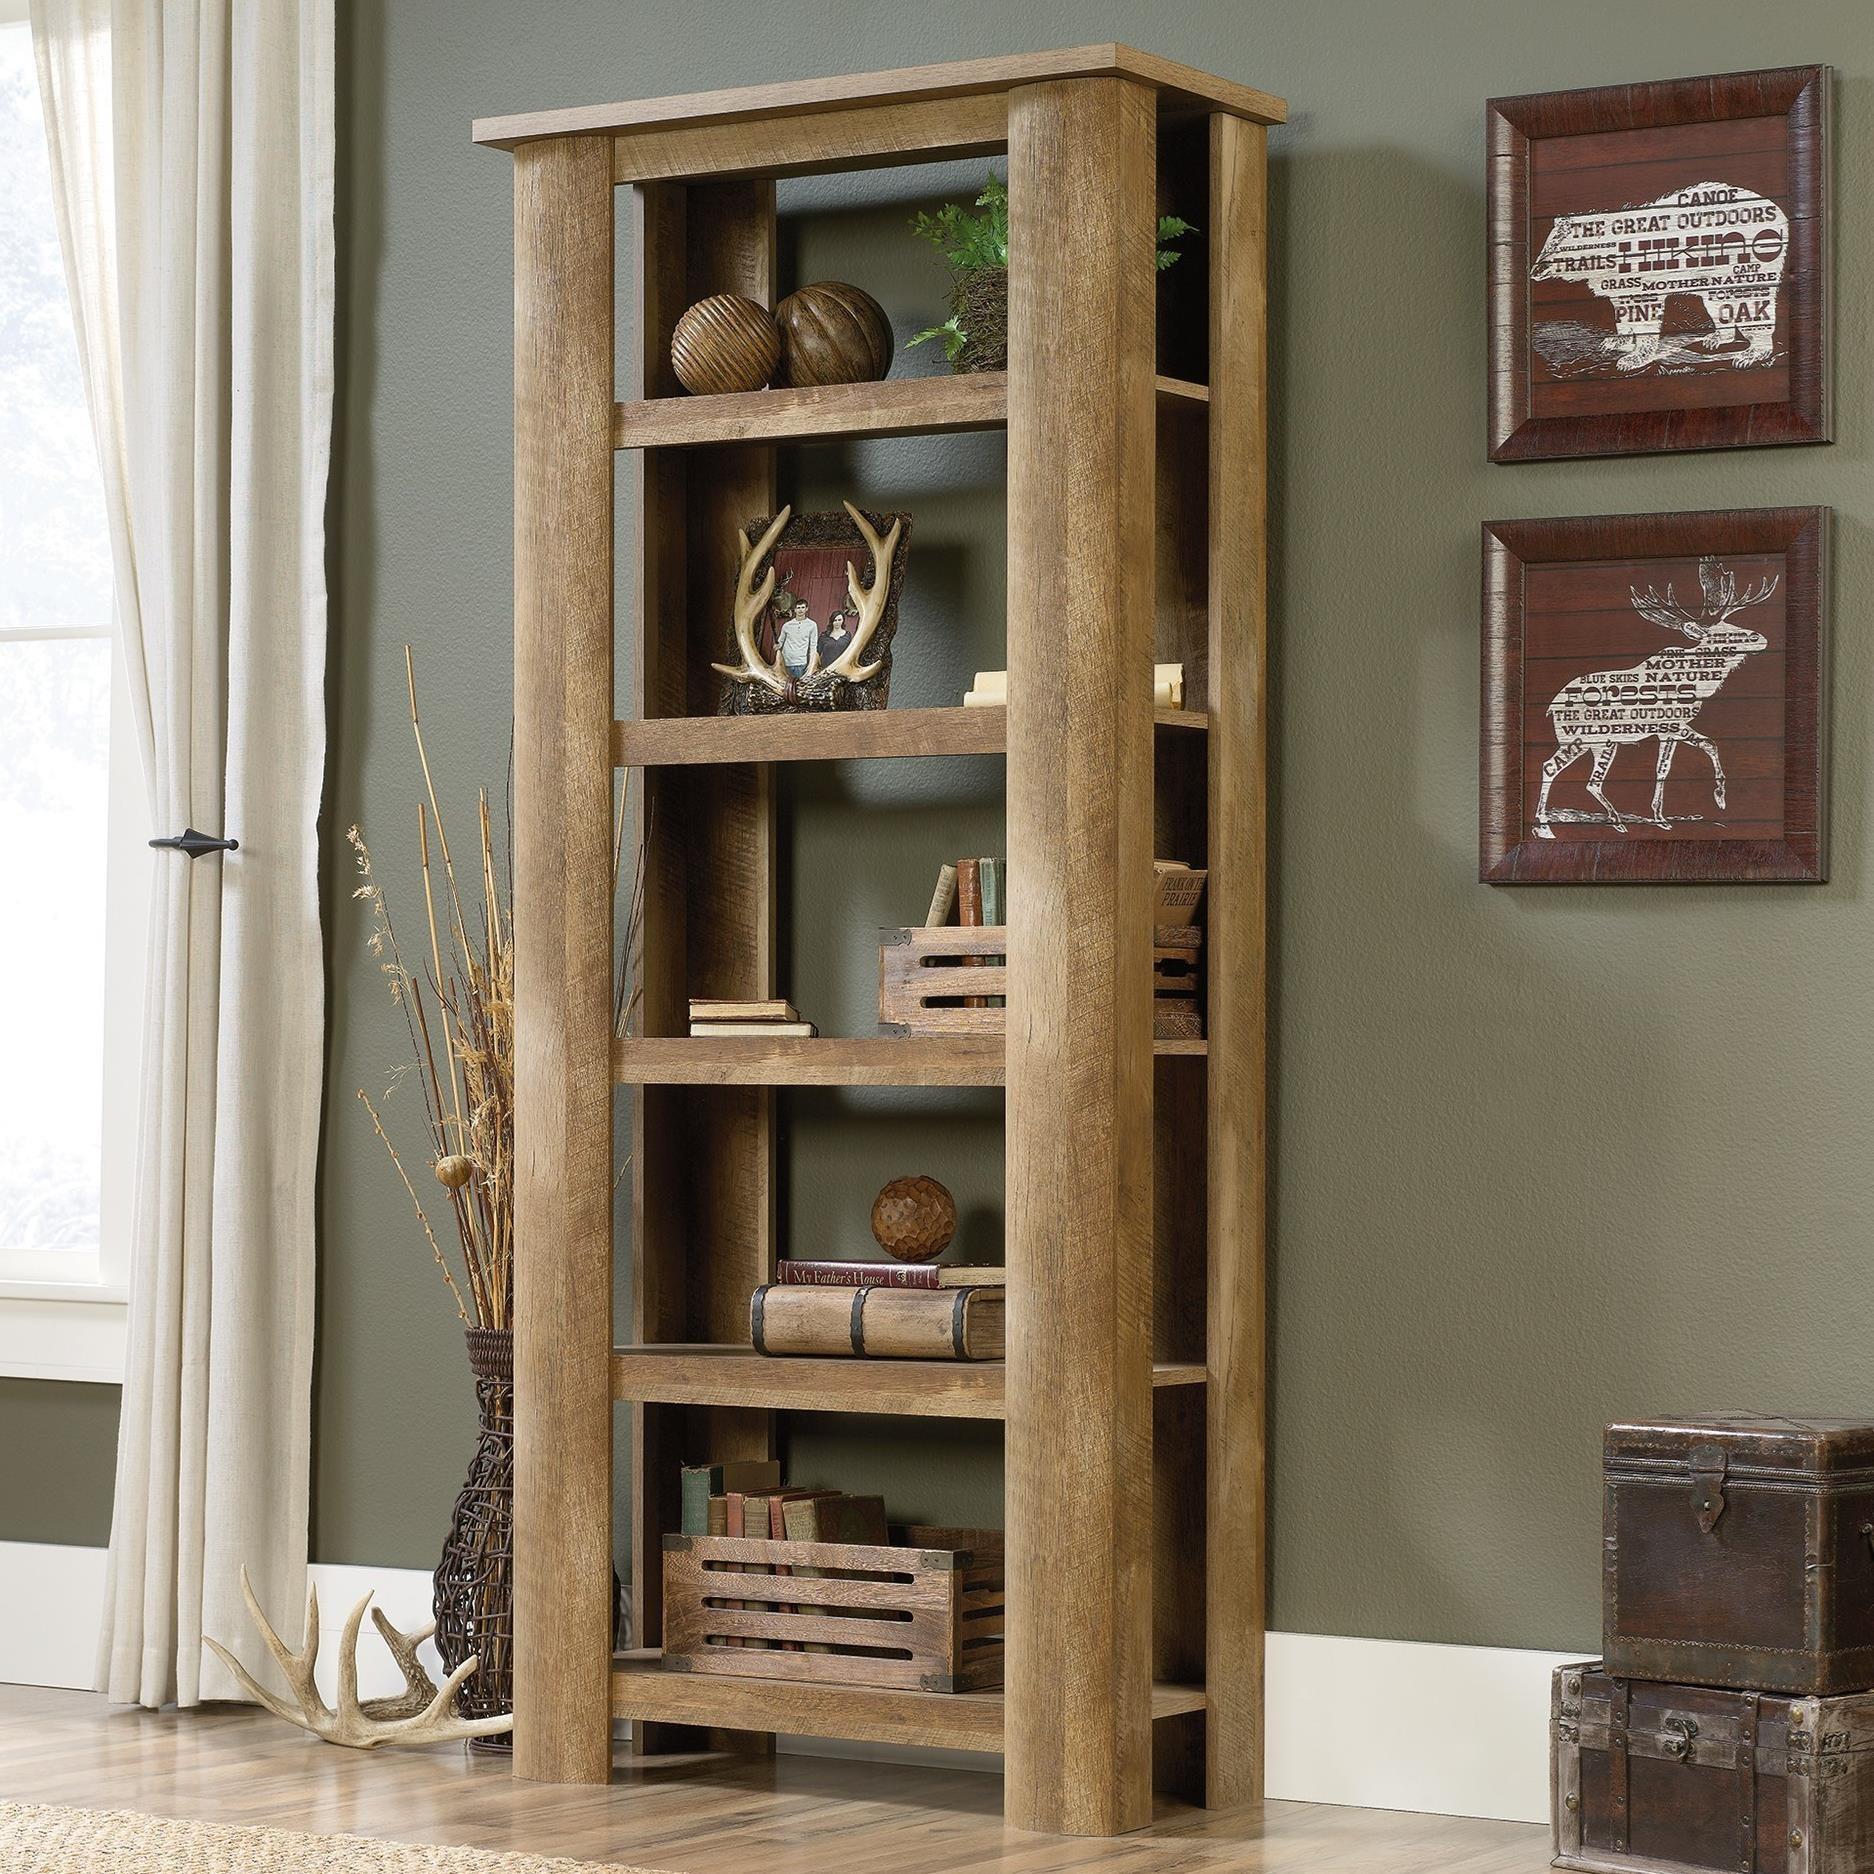 Sauder Boone Mountain Rustic Style 5 Shelf Bookcase